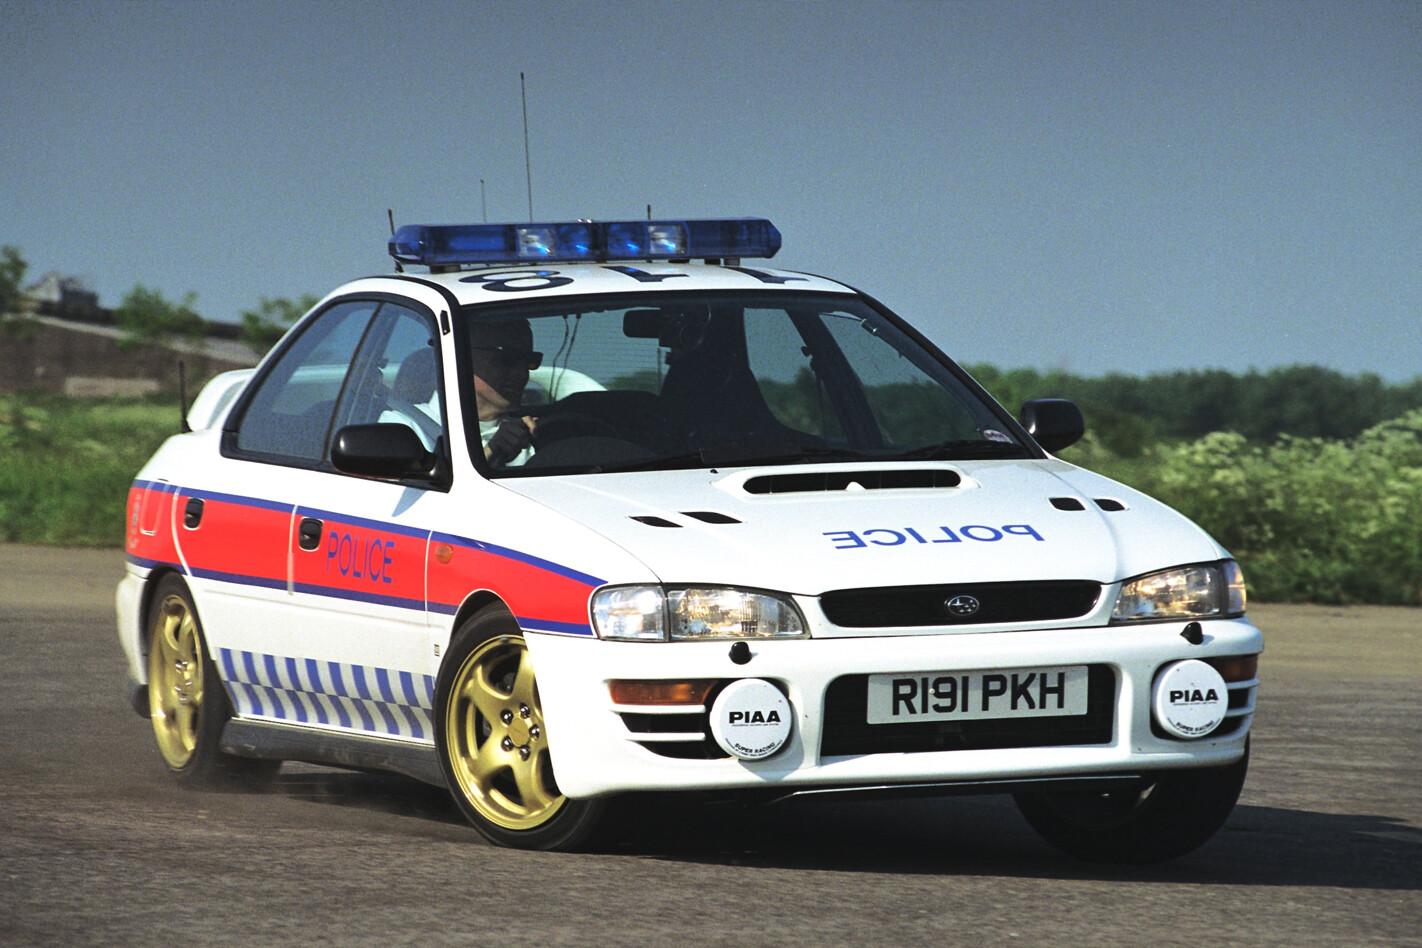 Subaru Impreza WRX police